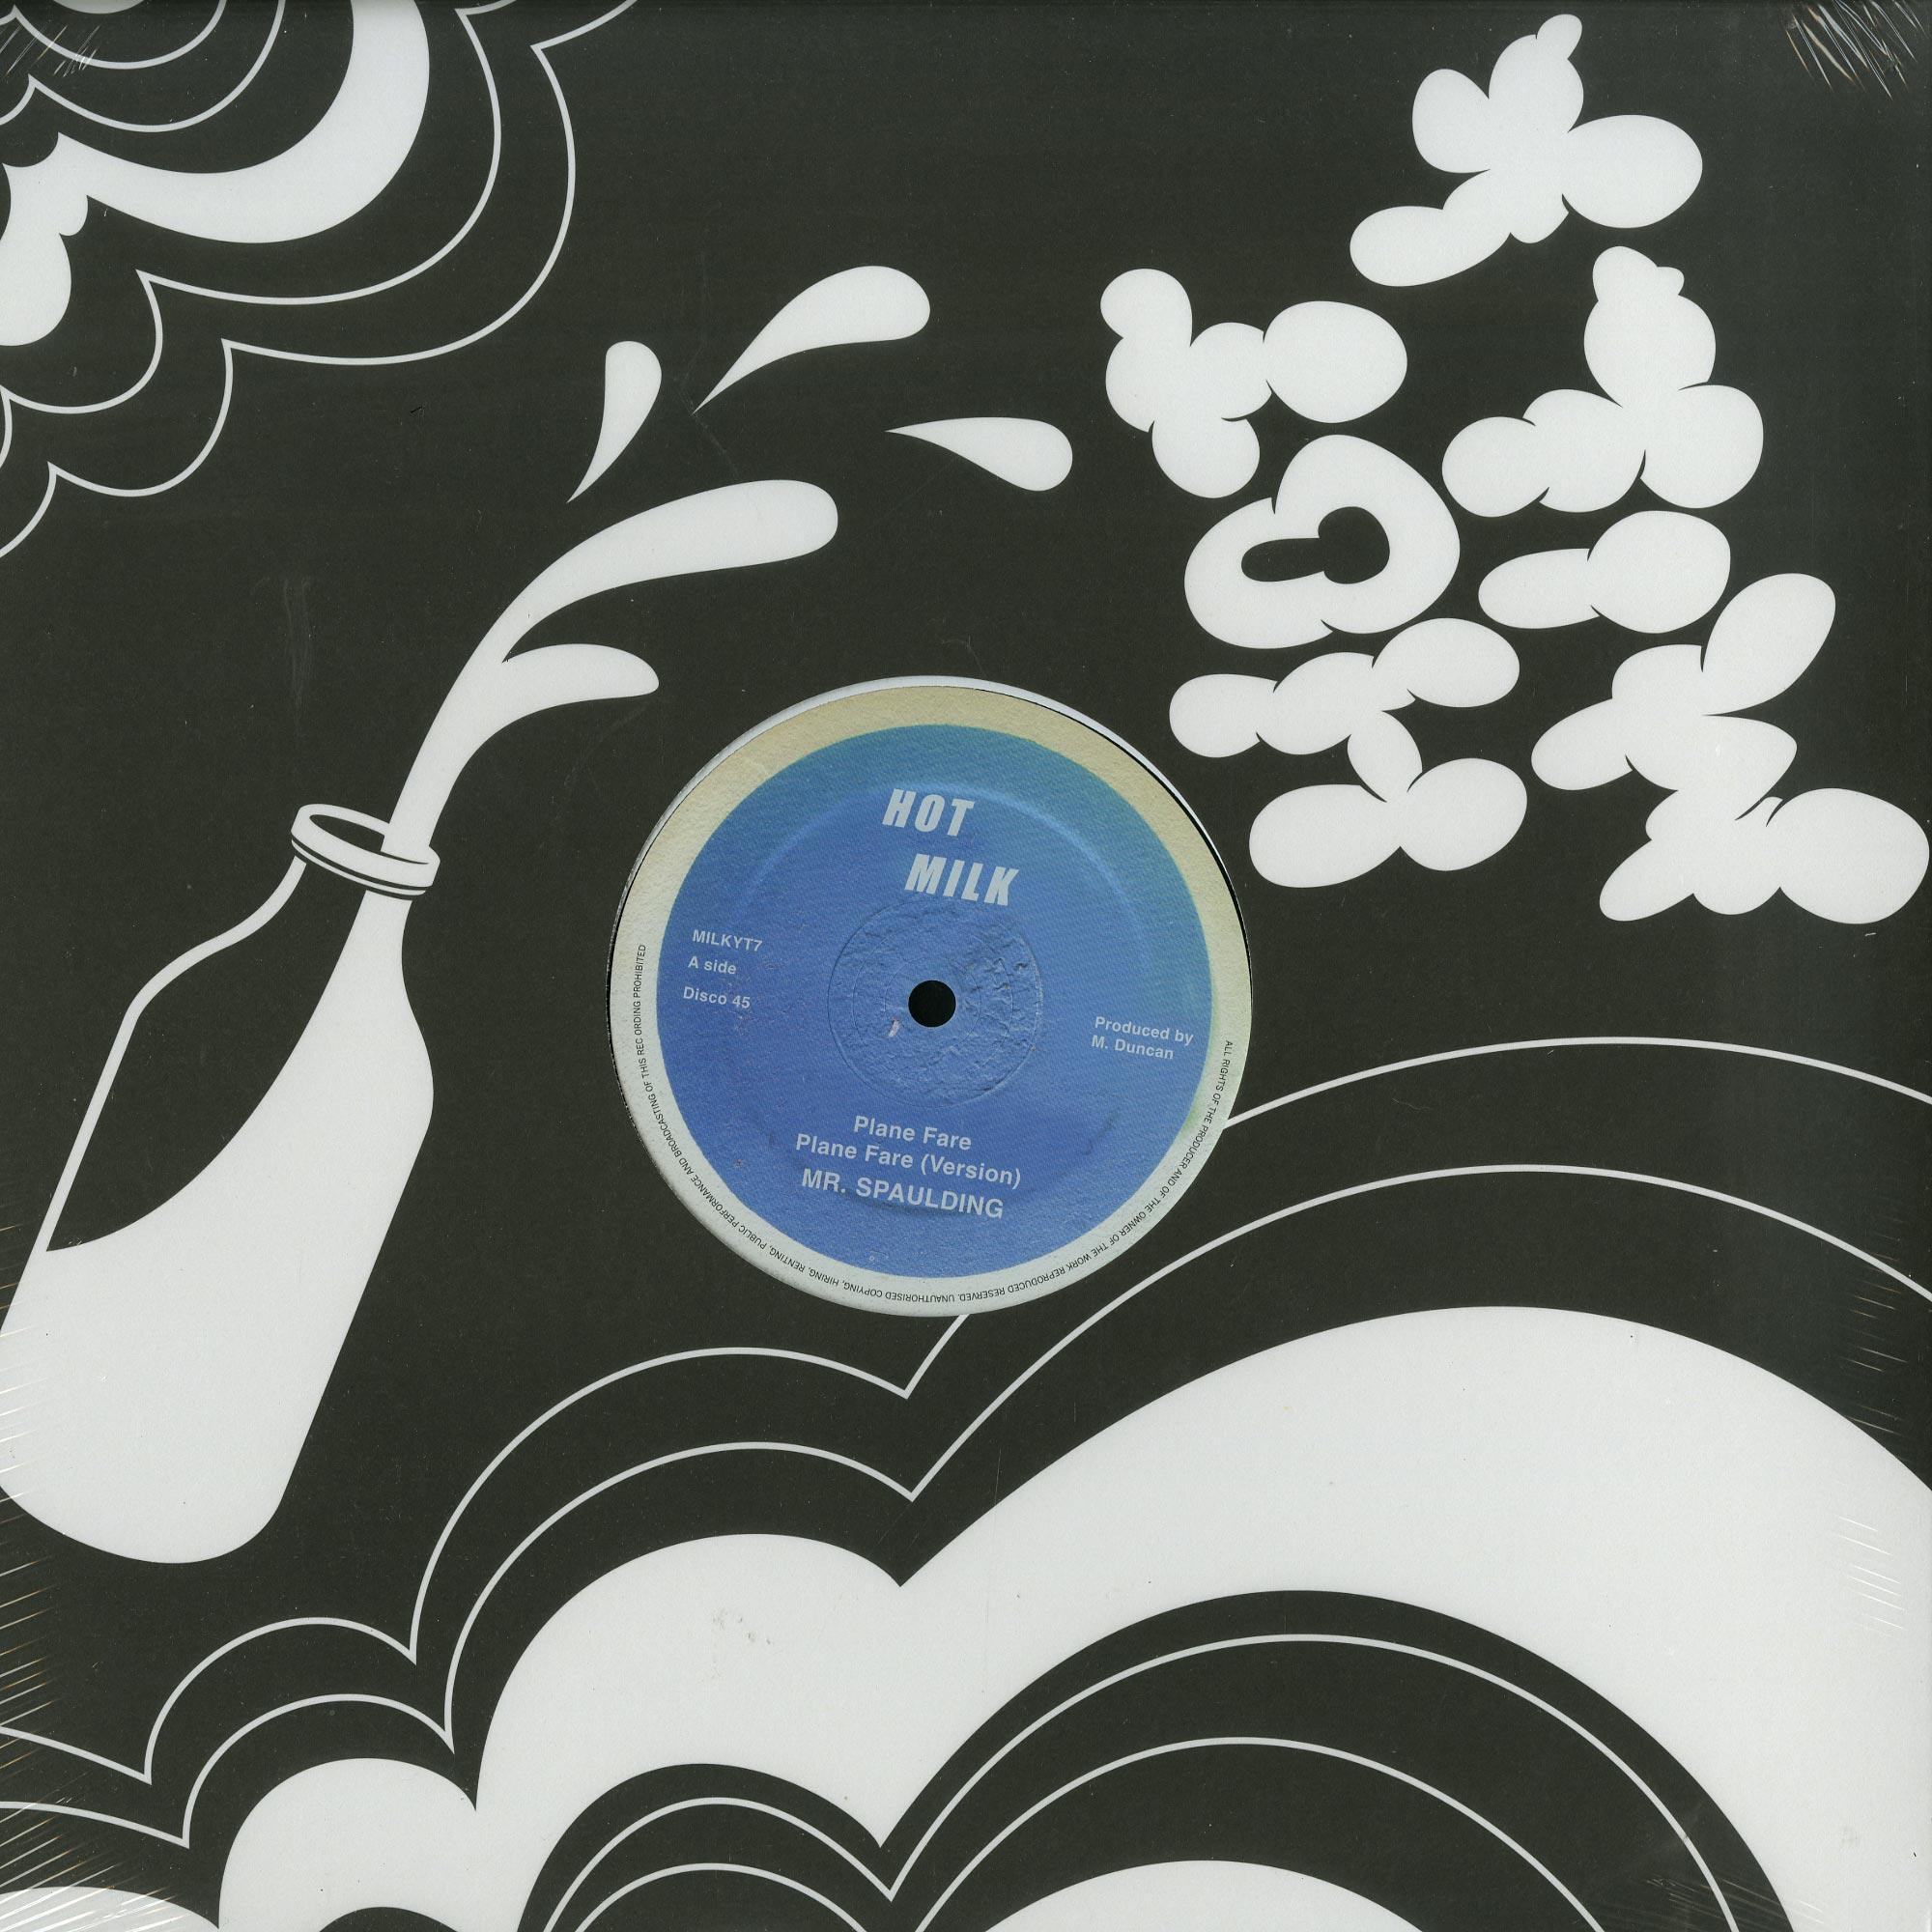 Mr. Spaulding - PLANE FARE / FANTASTIC EP